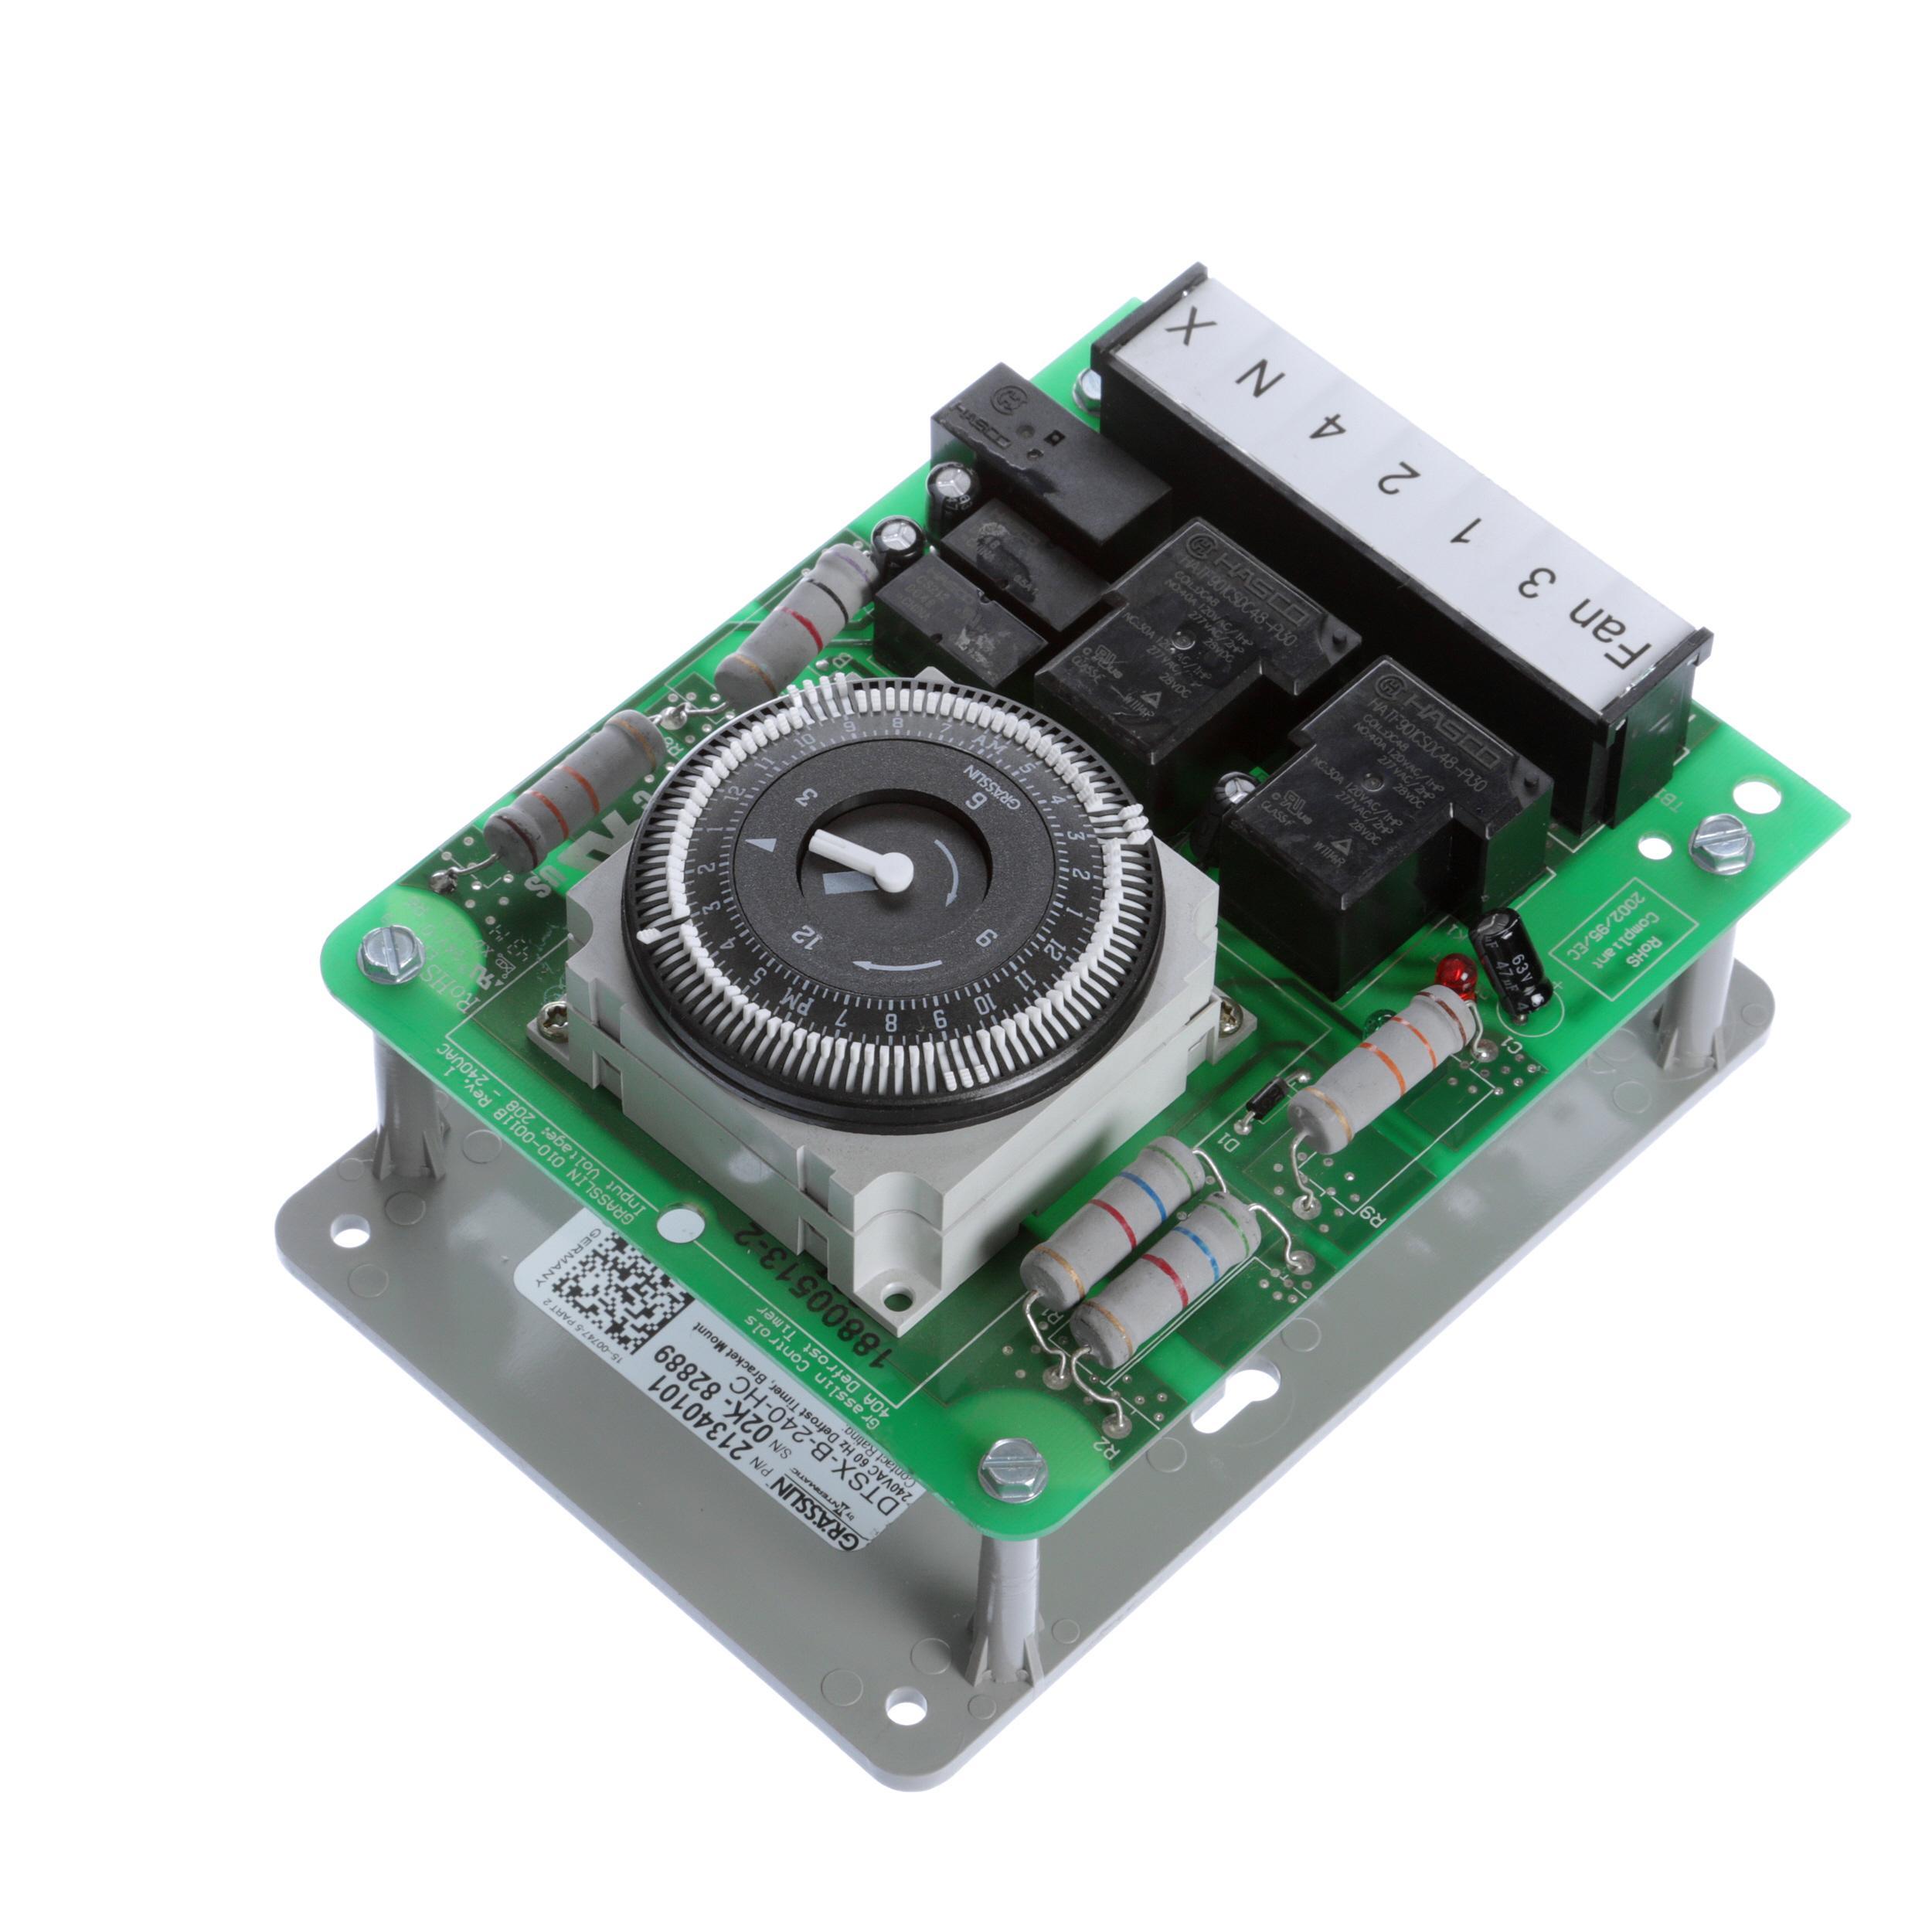 small resolution of heatcraft defrost timer 40 amp 230v 60hz dtsx240 part 21340101 rh heritageparts com 21340101 timer wiring diagram